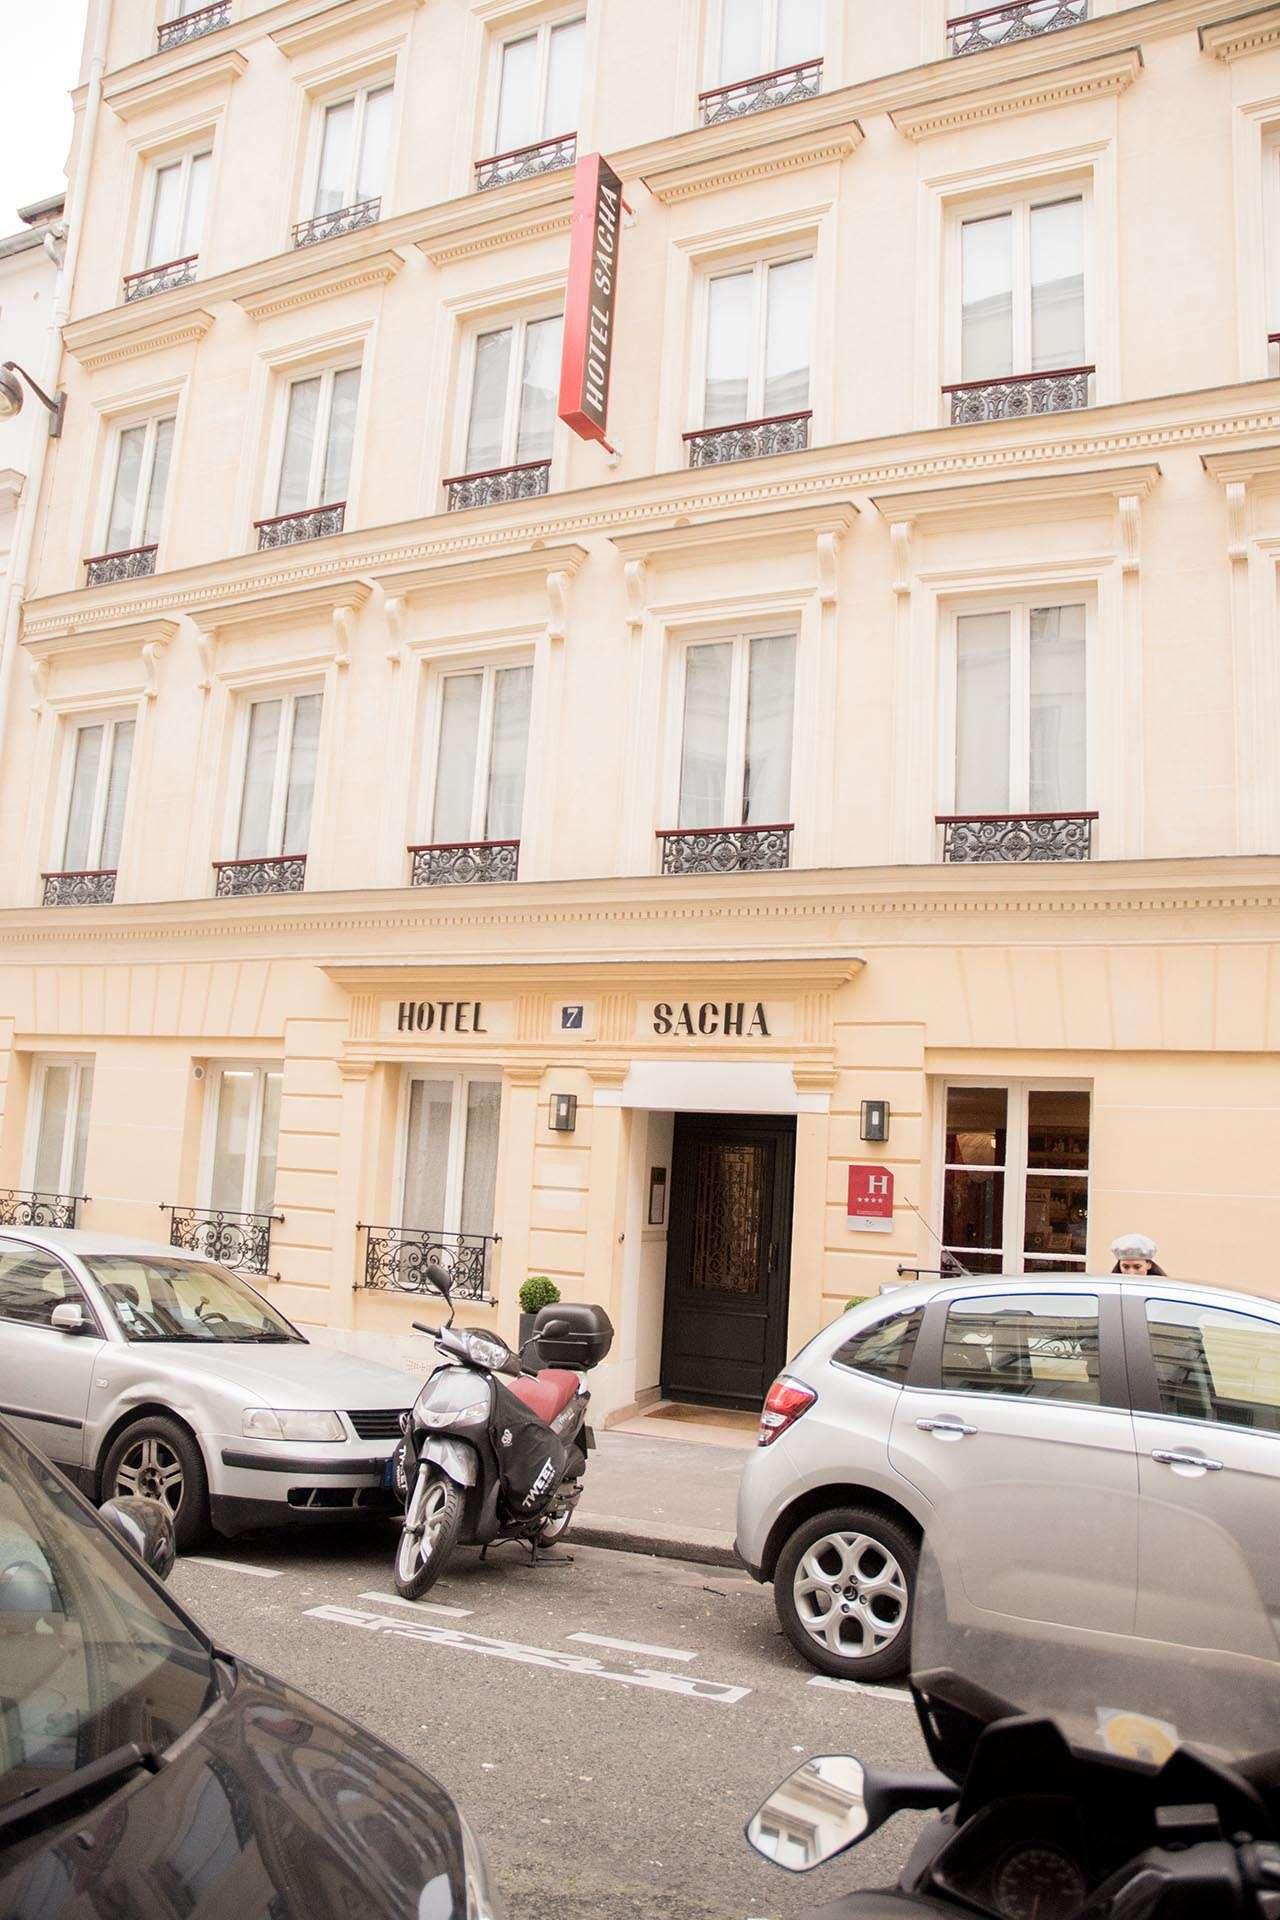 Exterior of Hotel Sacha